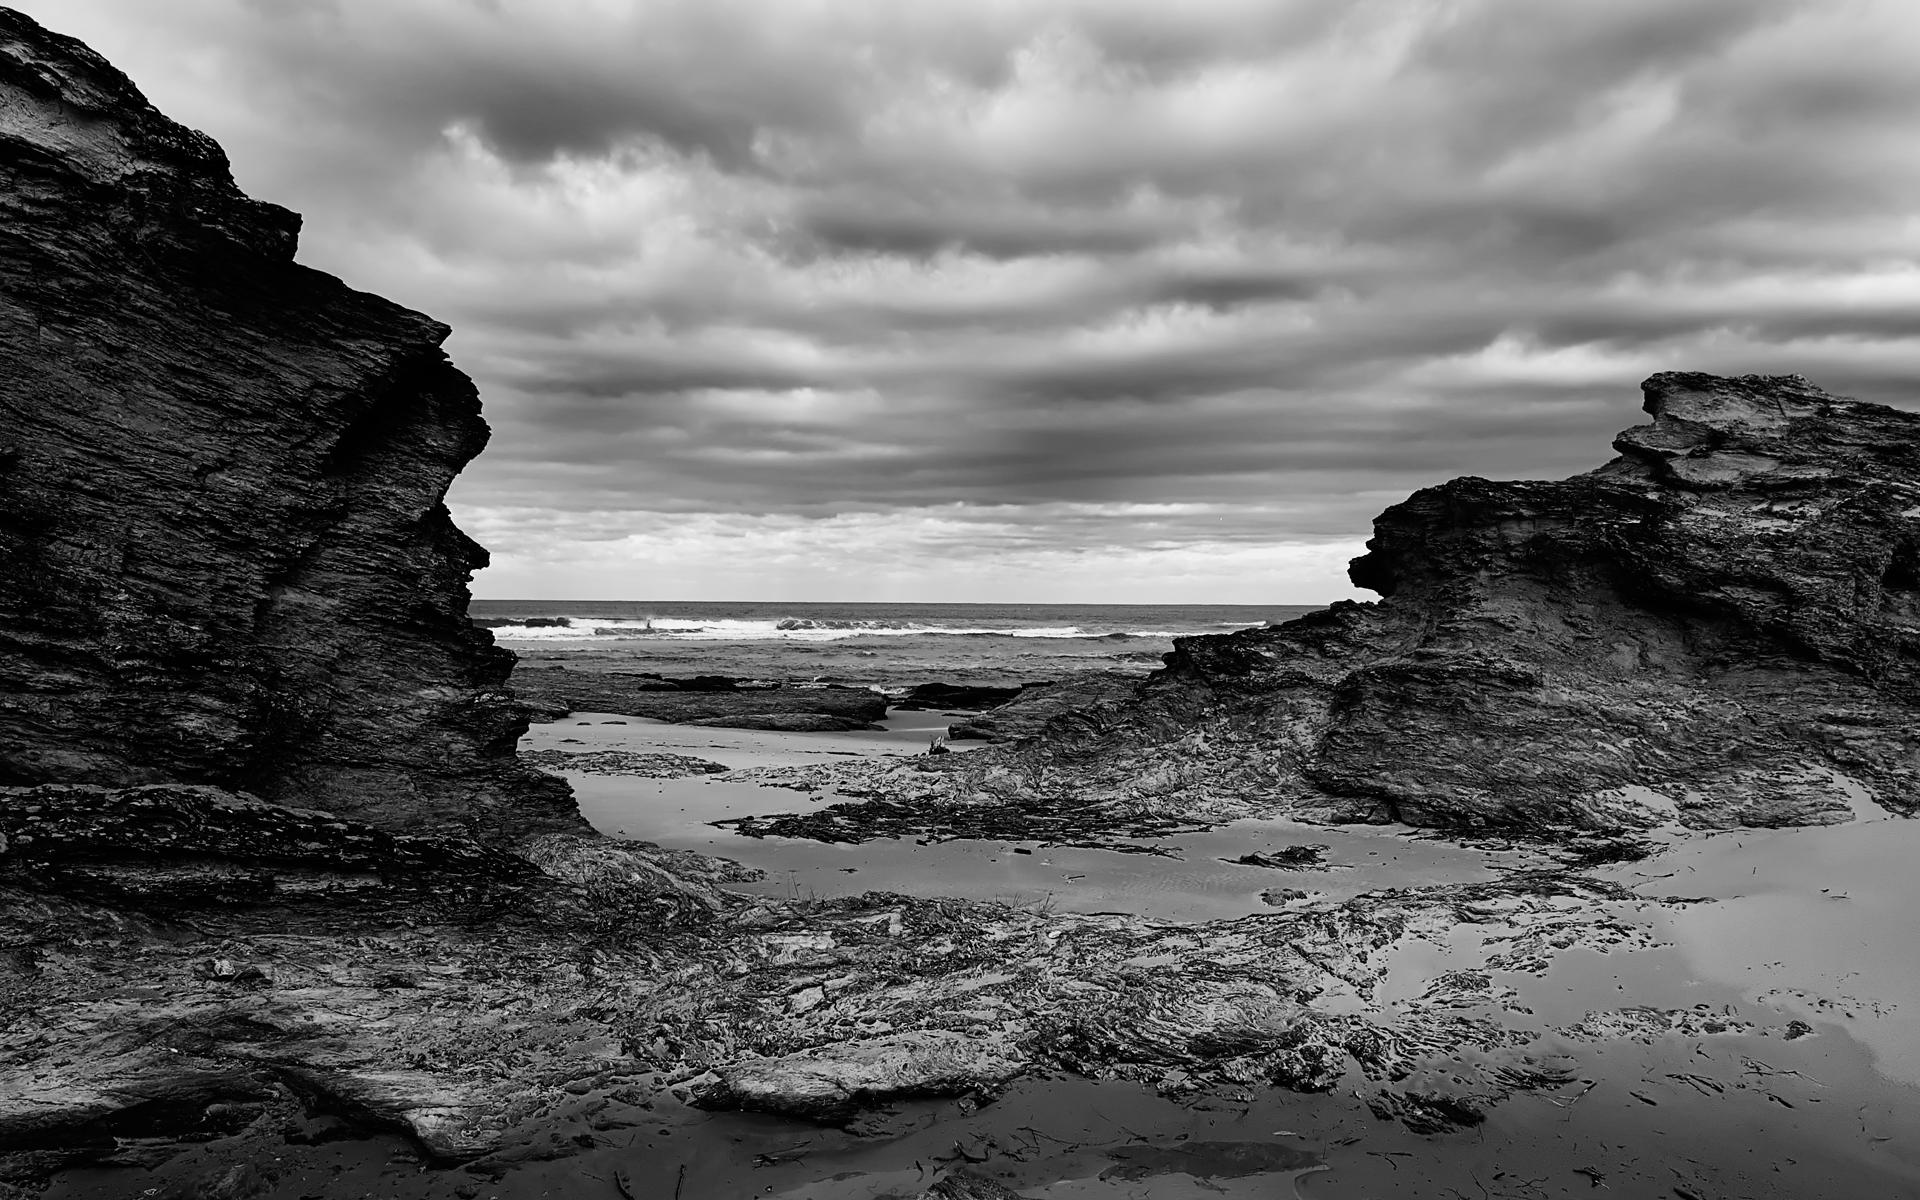 Black Rocks by Vraxor22 on DeviantArt